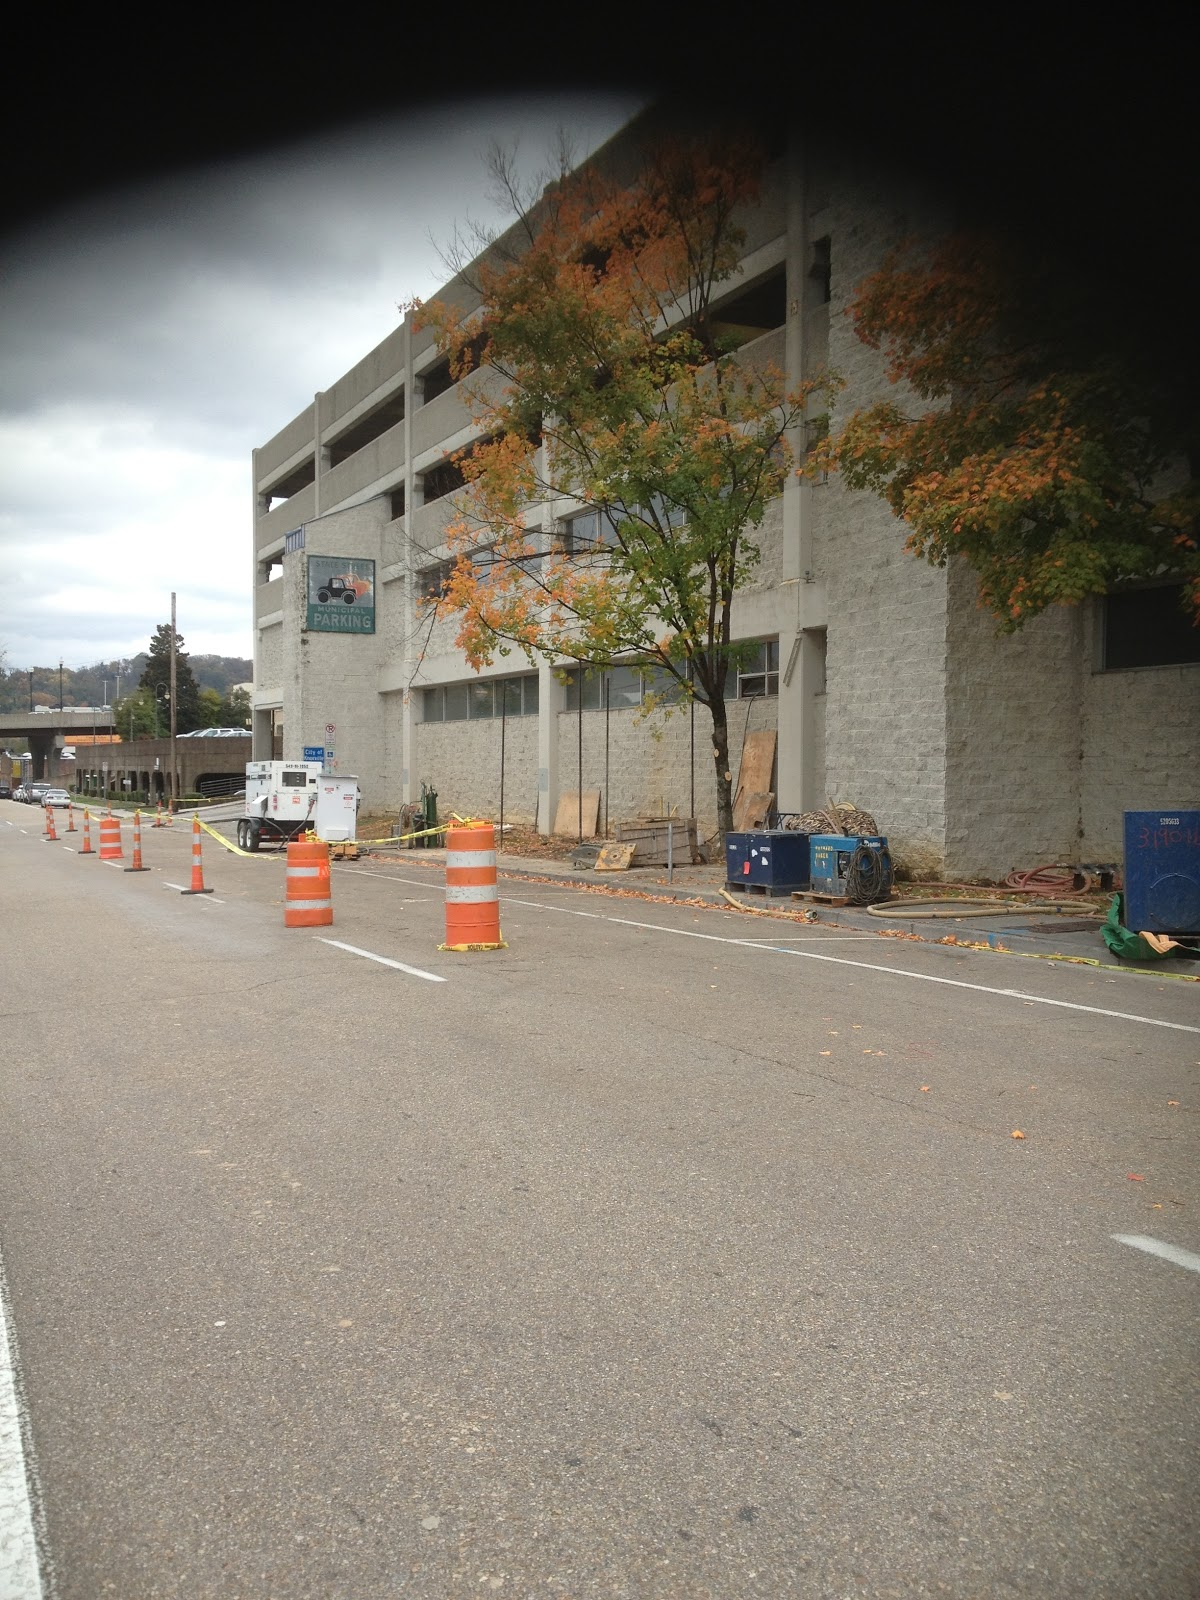 State Street Garage : State street garage update knox beat